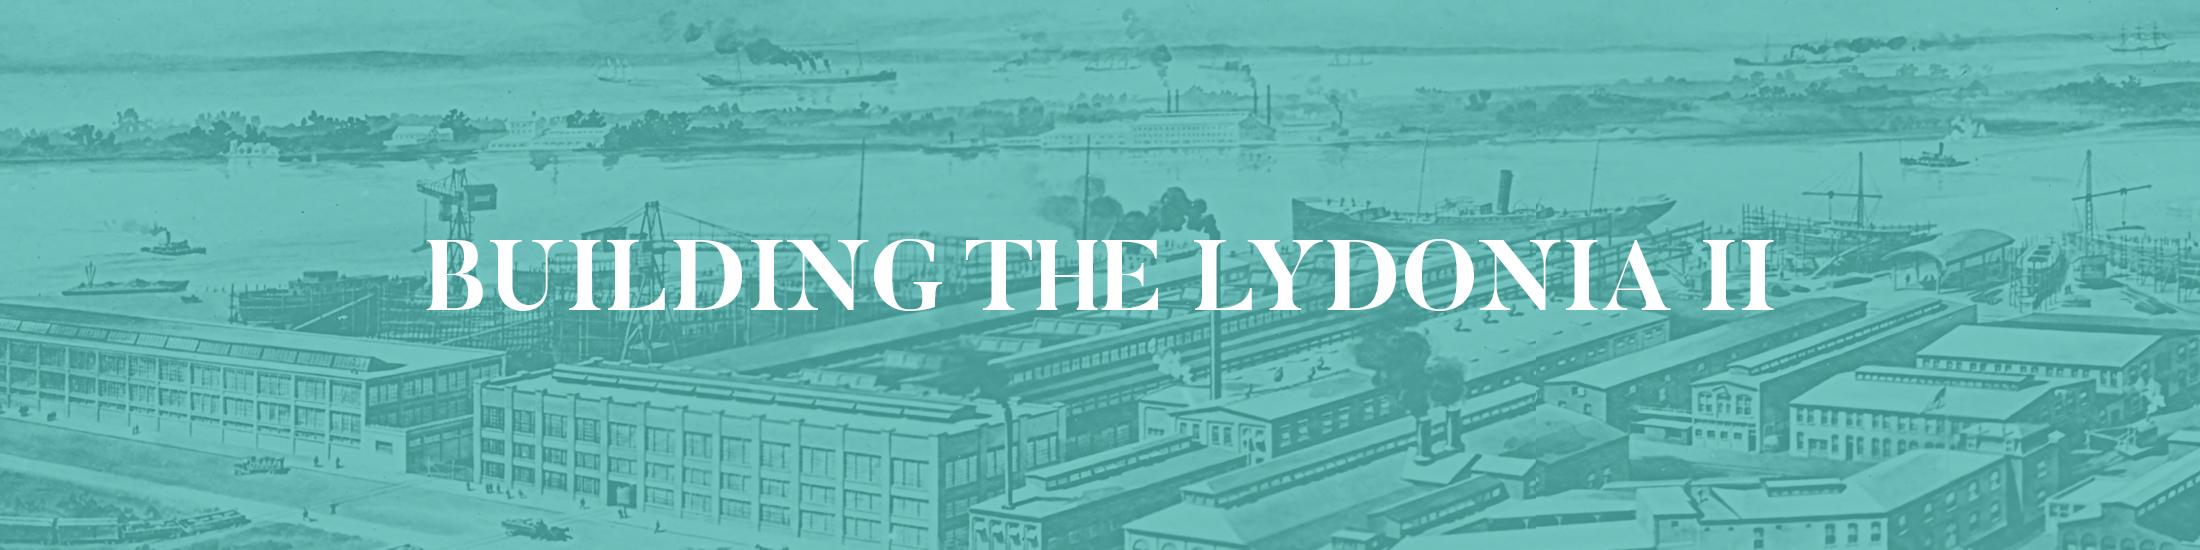 Building the Lydonia II digital exhibit